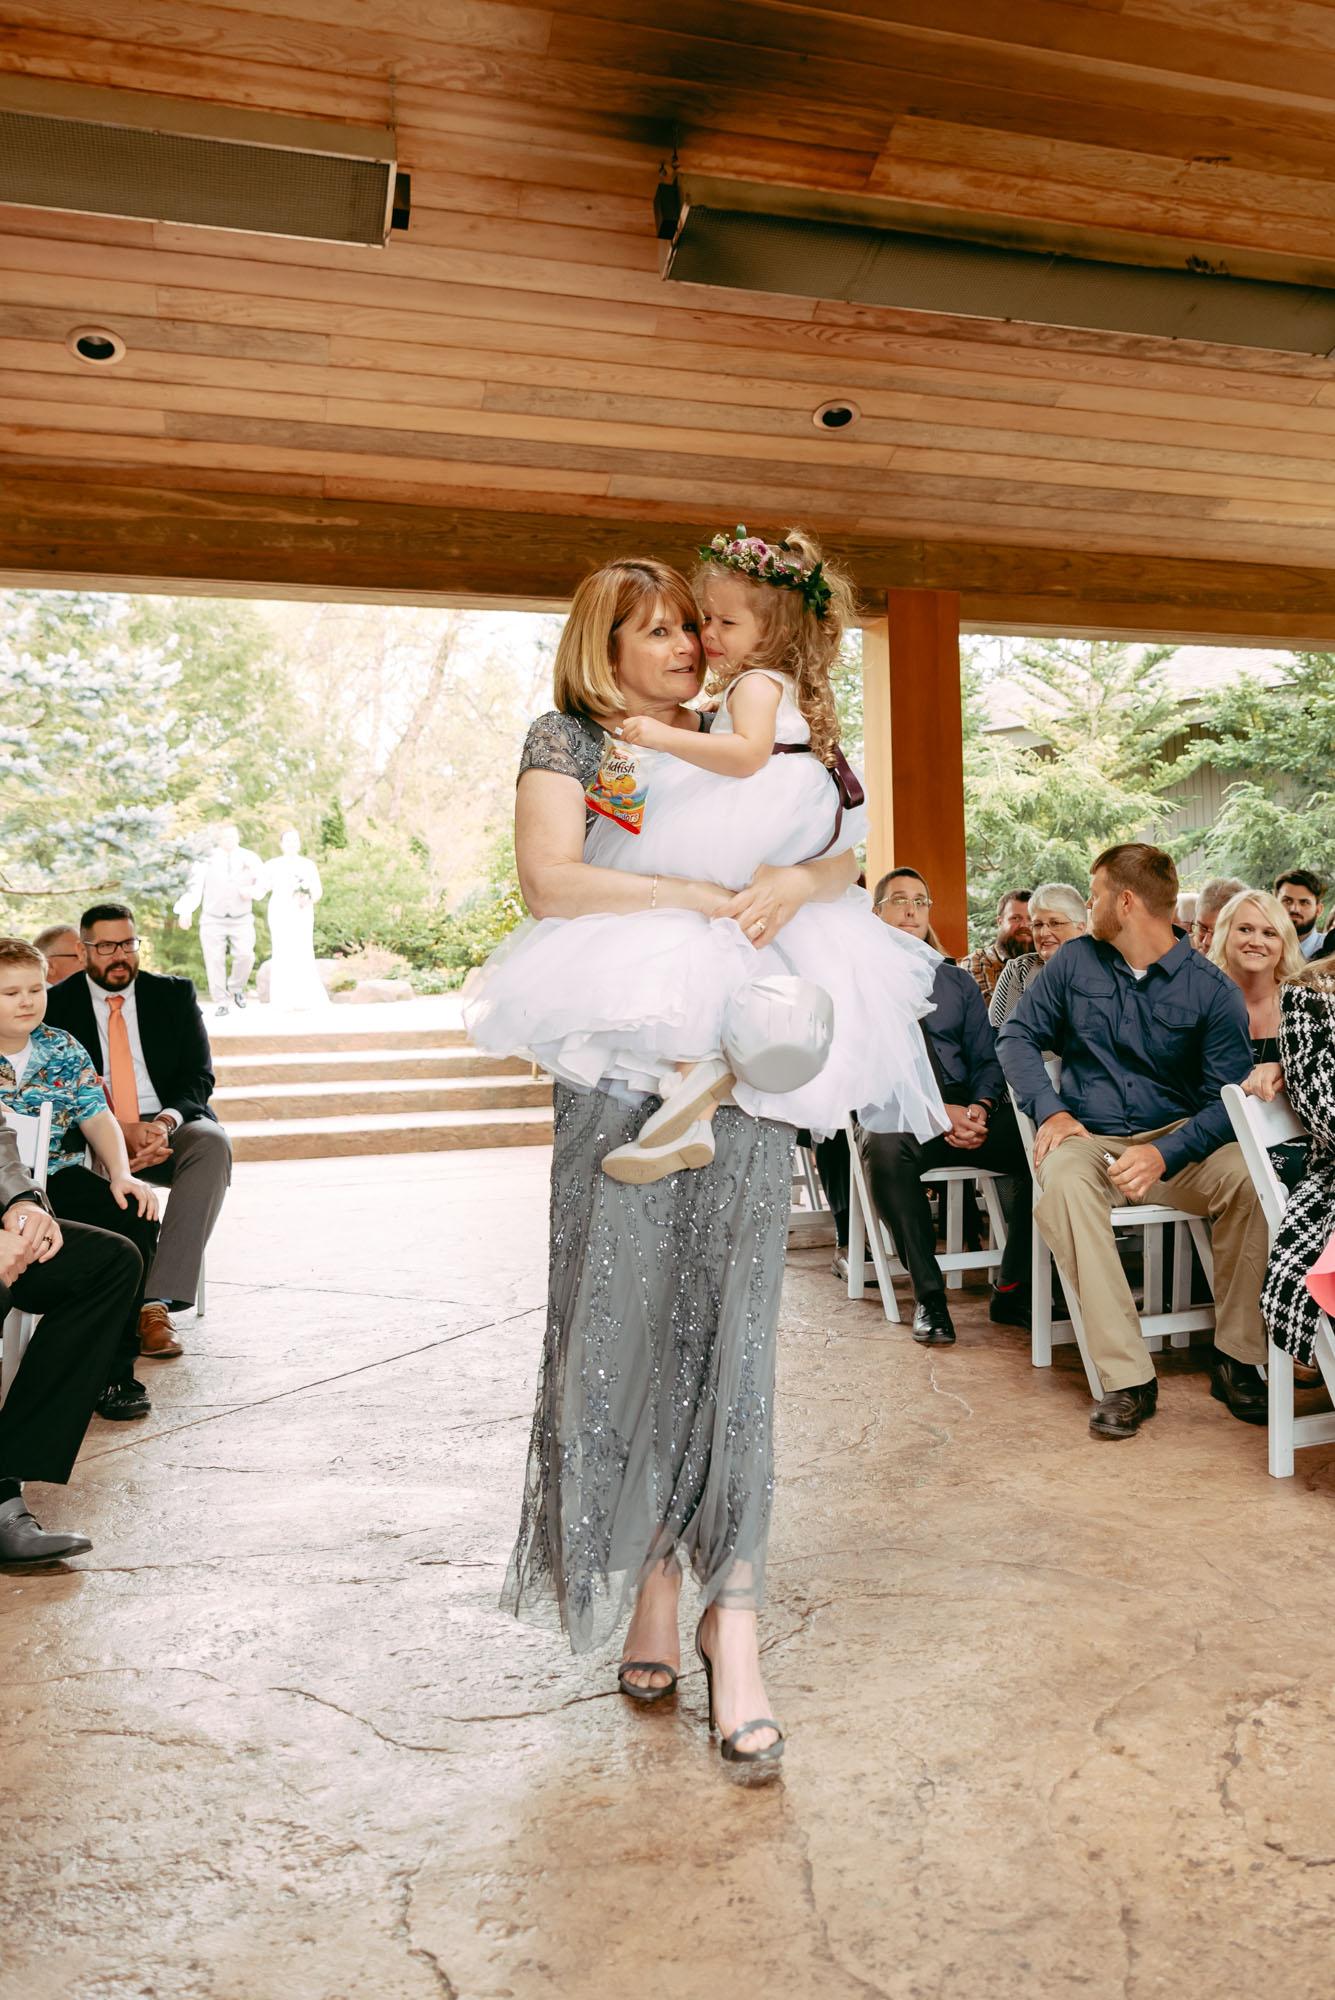 prairie-street-brewhouse-wedding-Rockford-IL-wedding-photographers-120.jpg